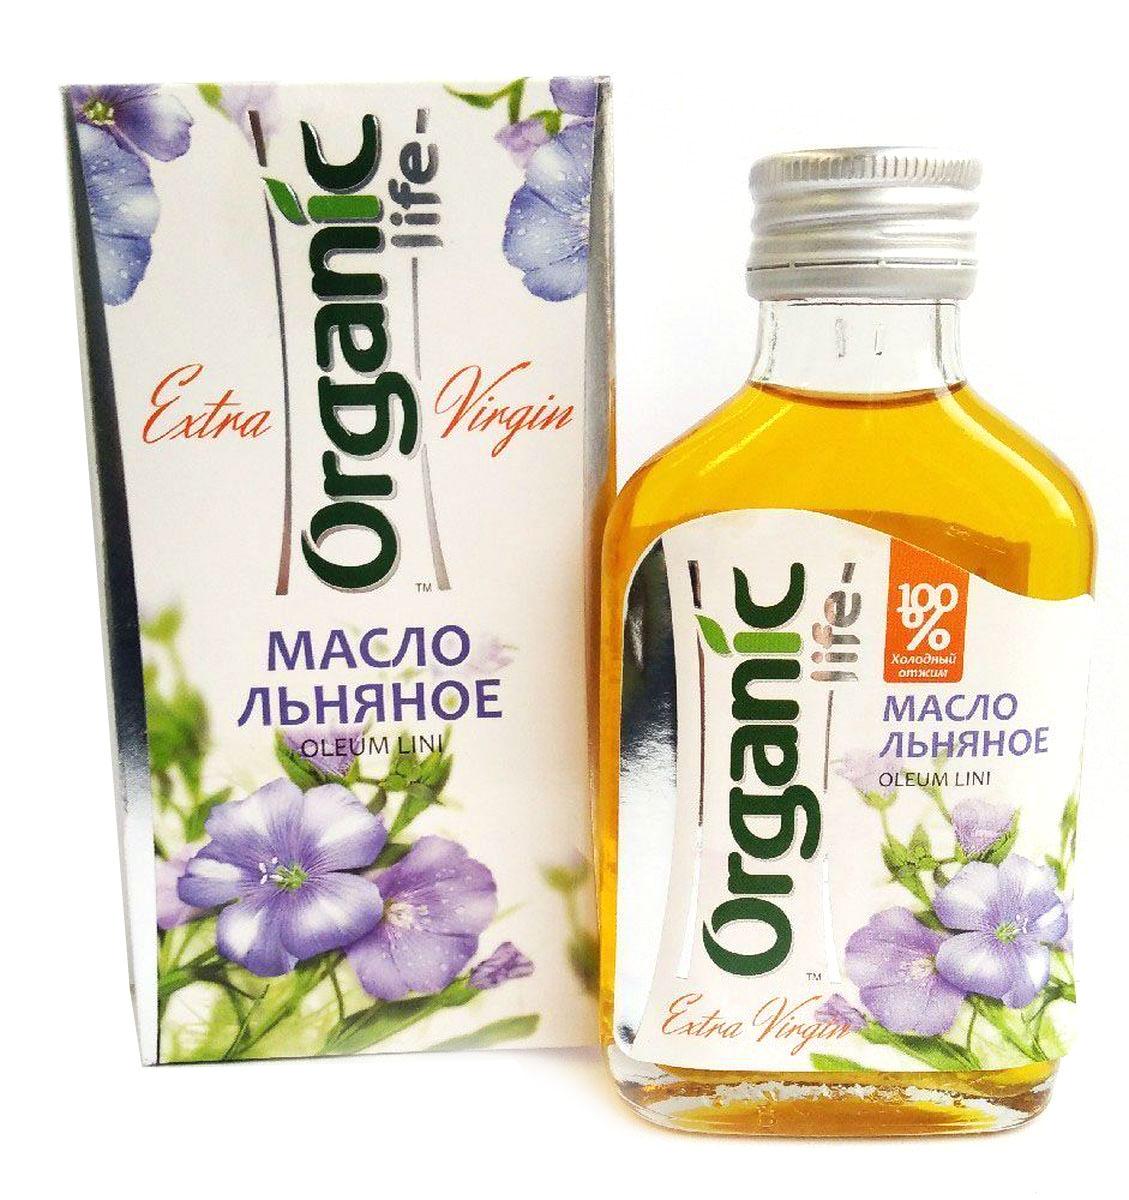 Organic Life масло льняное, 100 мл